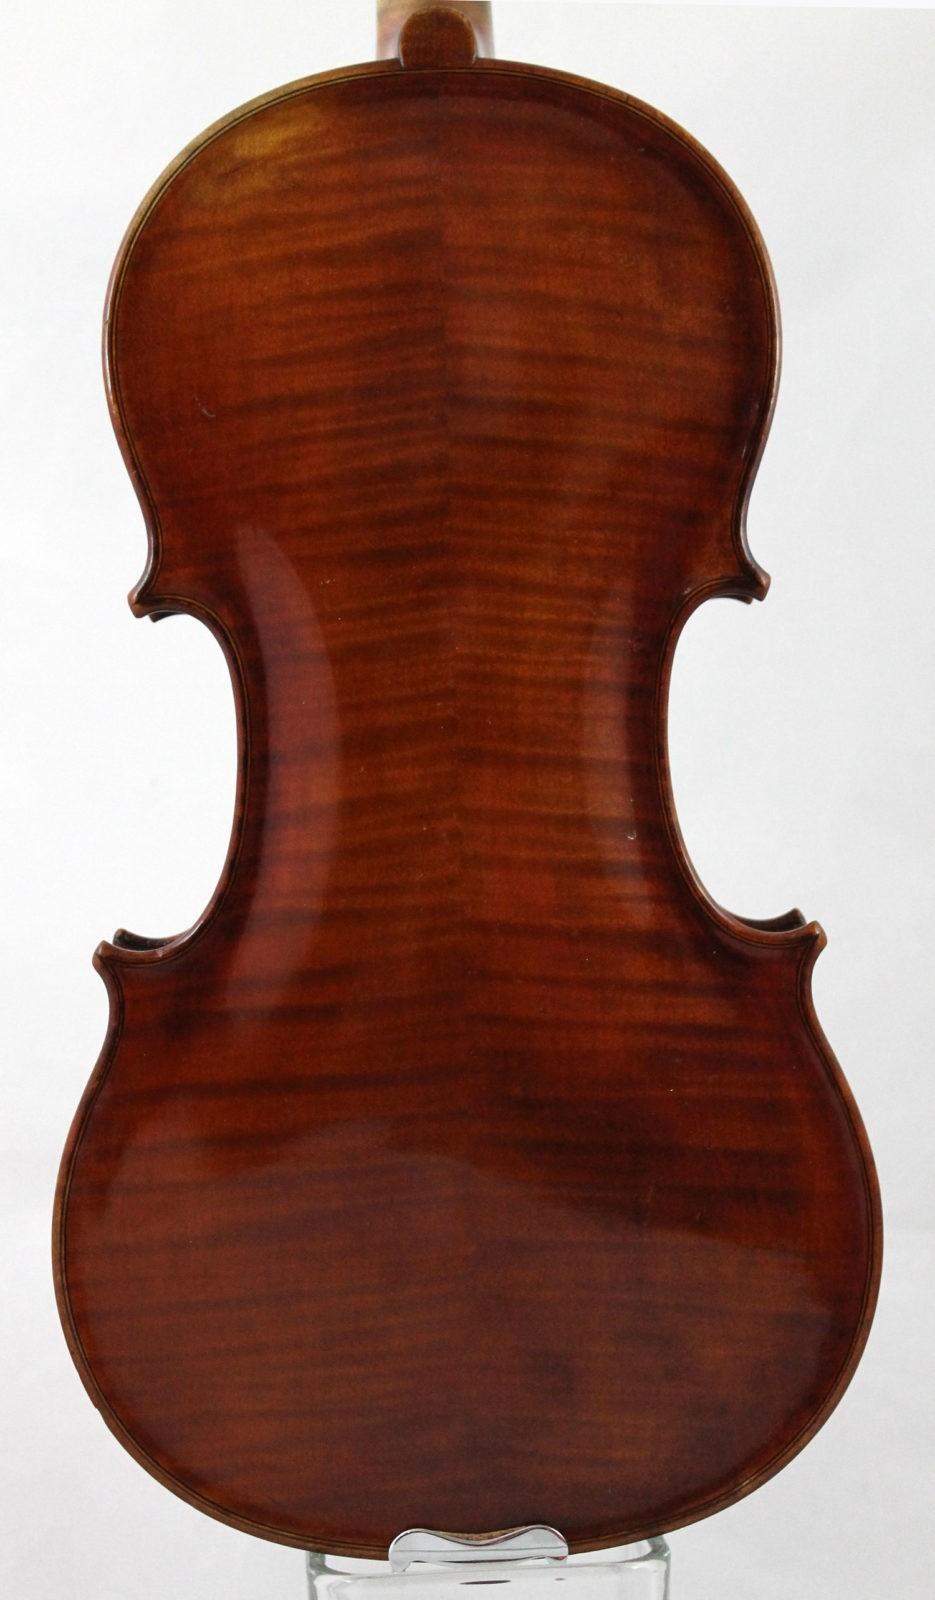 Raymond Collenot violin - back